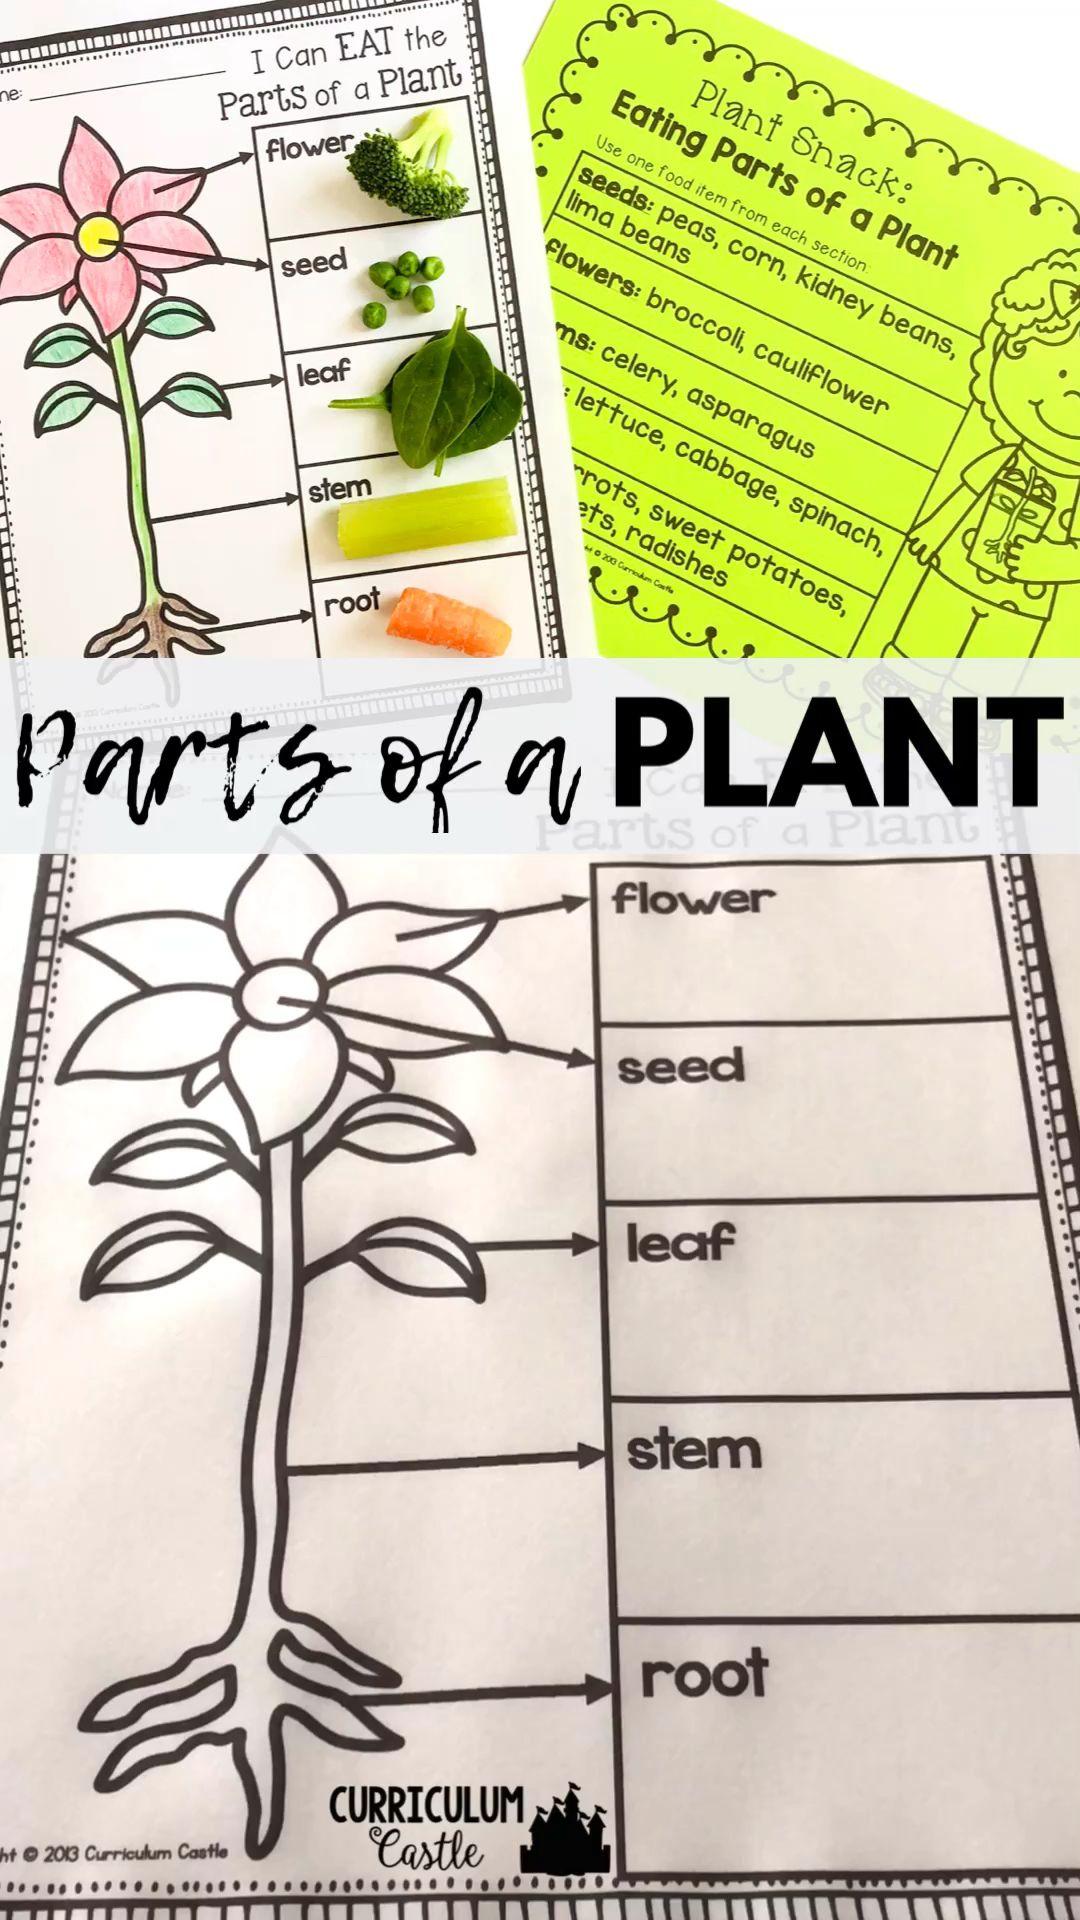 Parts Of A Plant Activity Video Plant Life Cycle Plant Activities Parts Of A Plant [ 1920 x 1080 Pixel ]